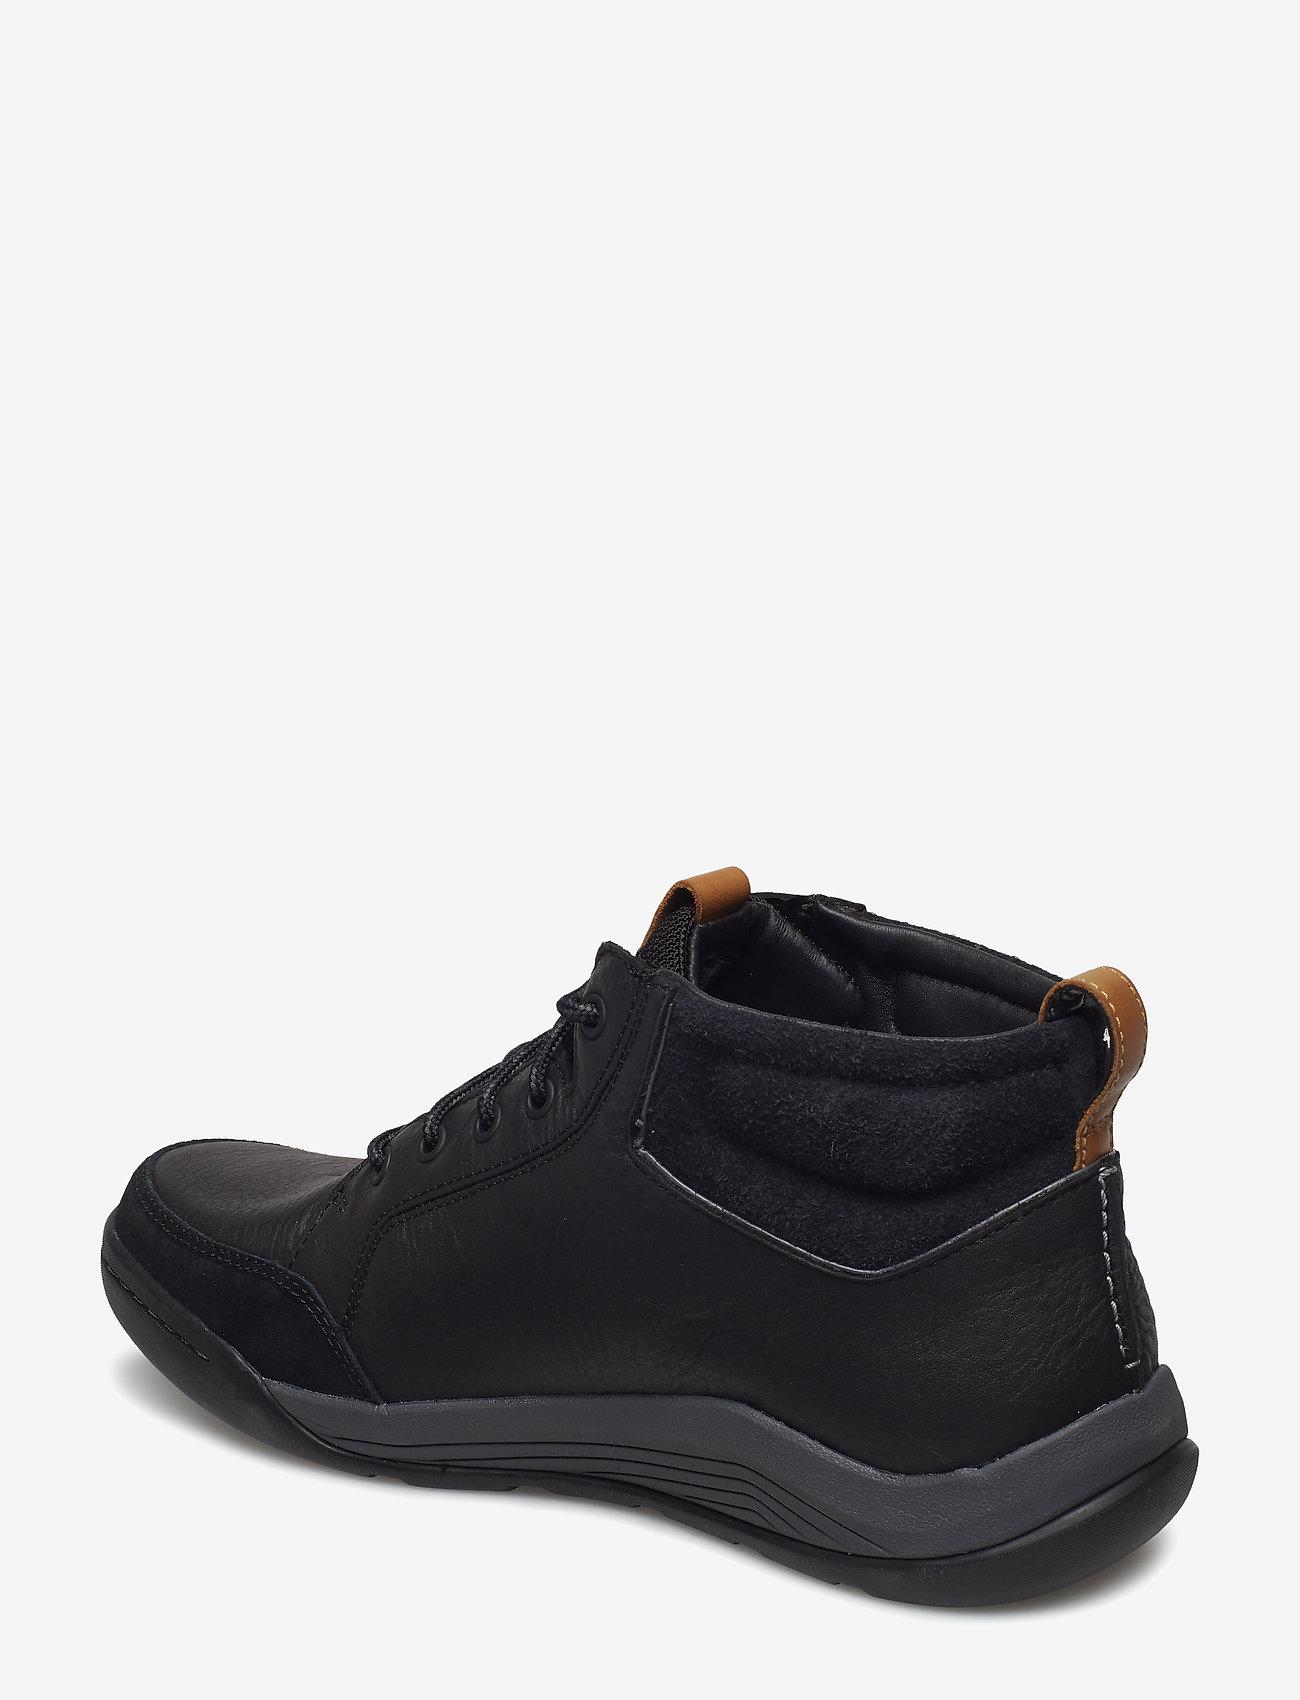 Ashcombemidgtx (Black Leather) - Clarks